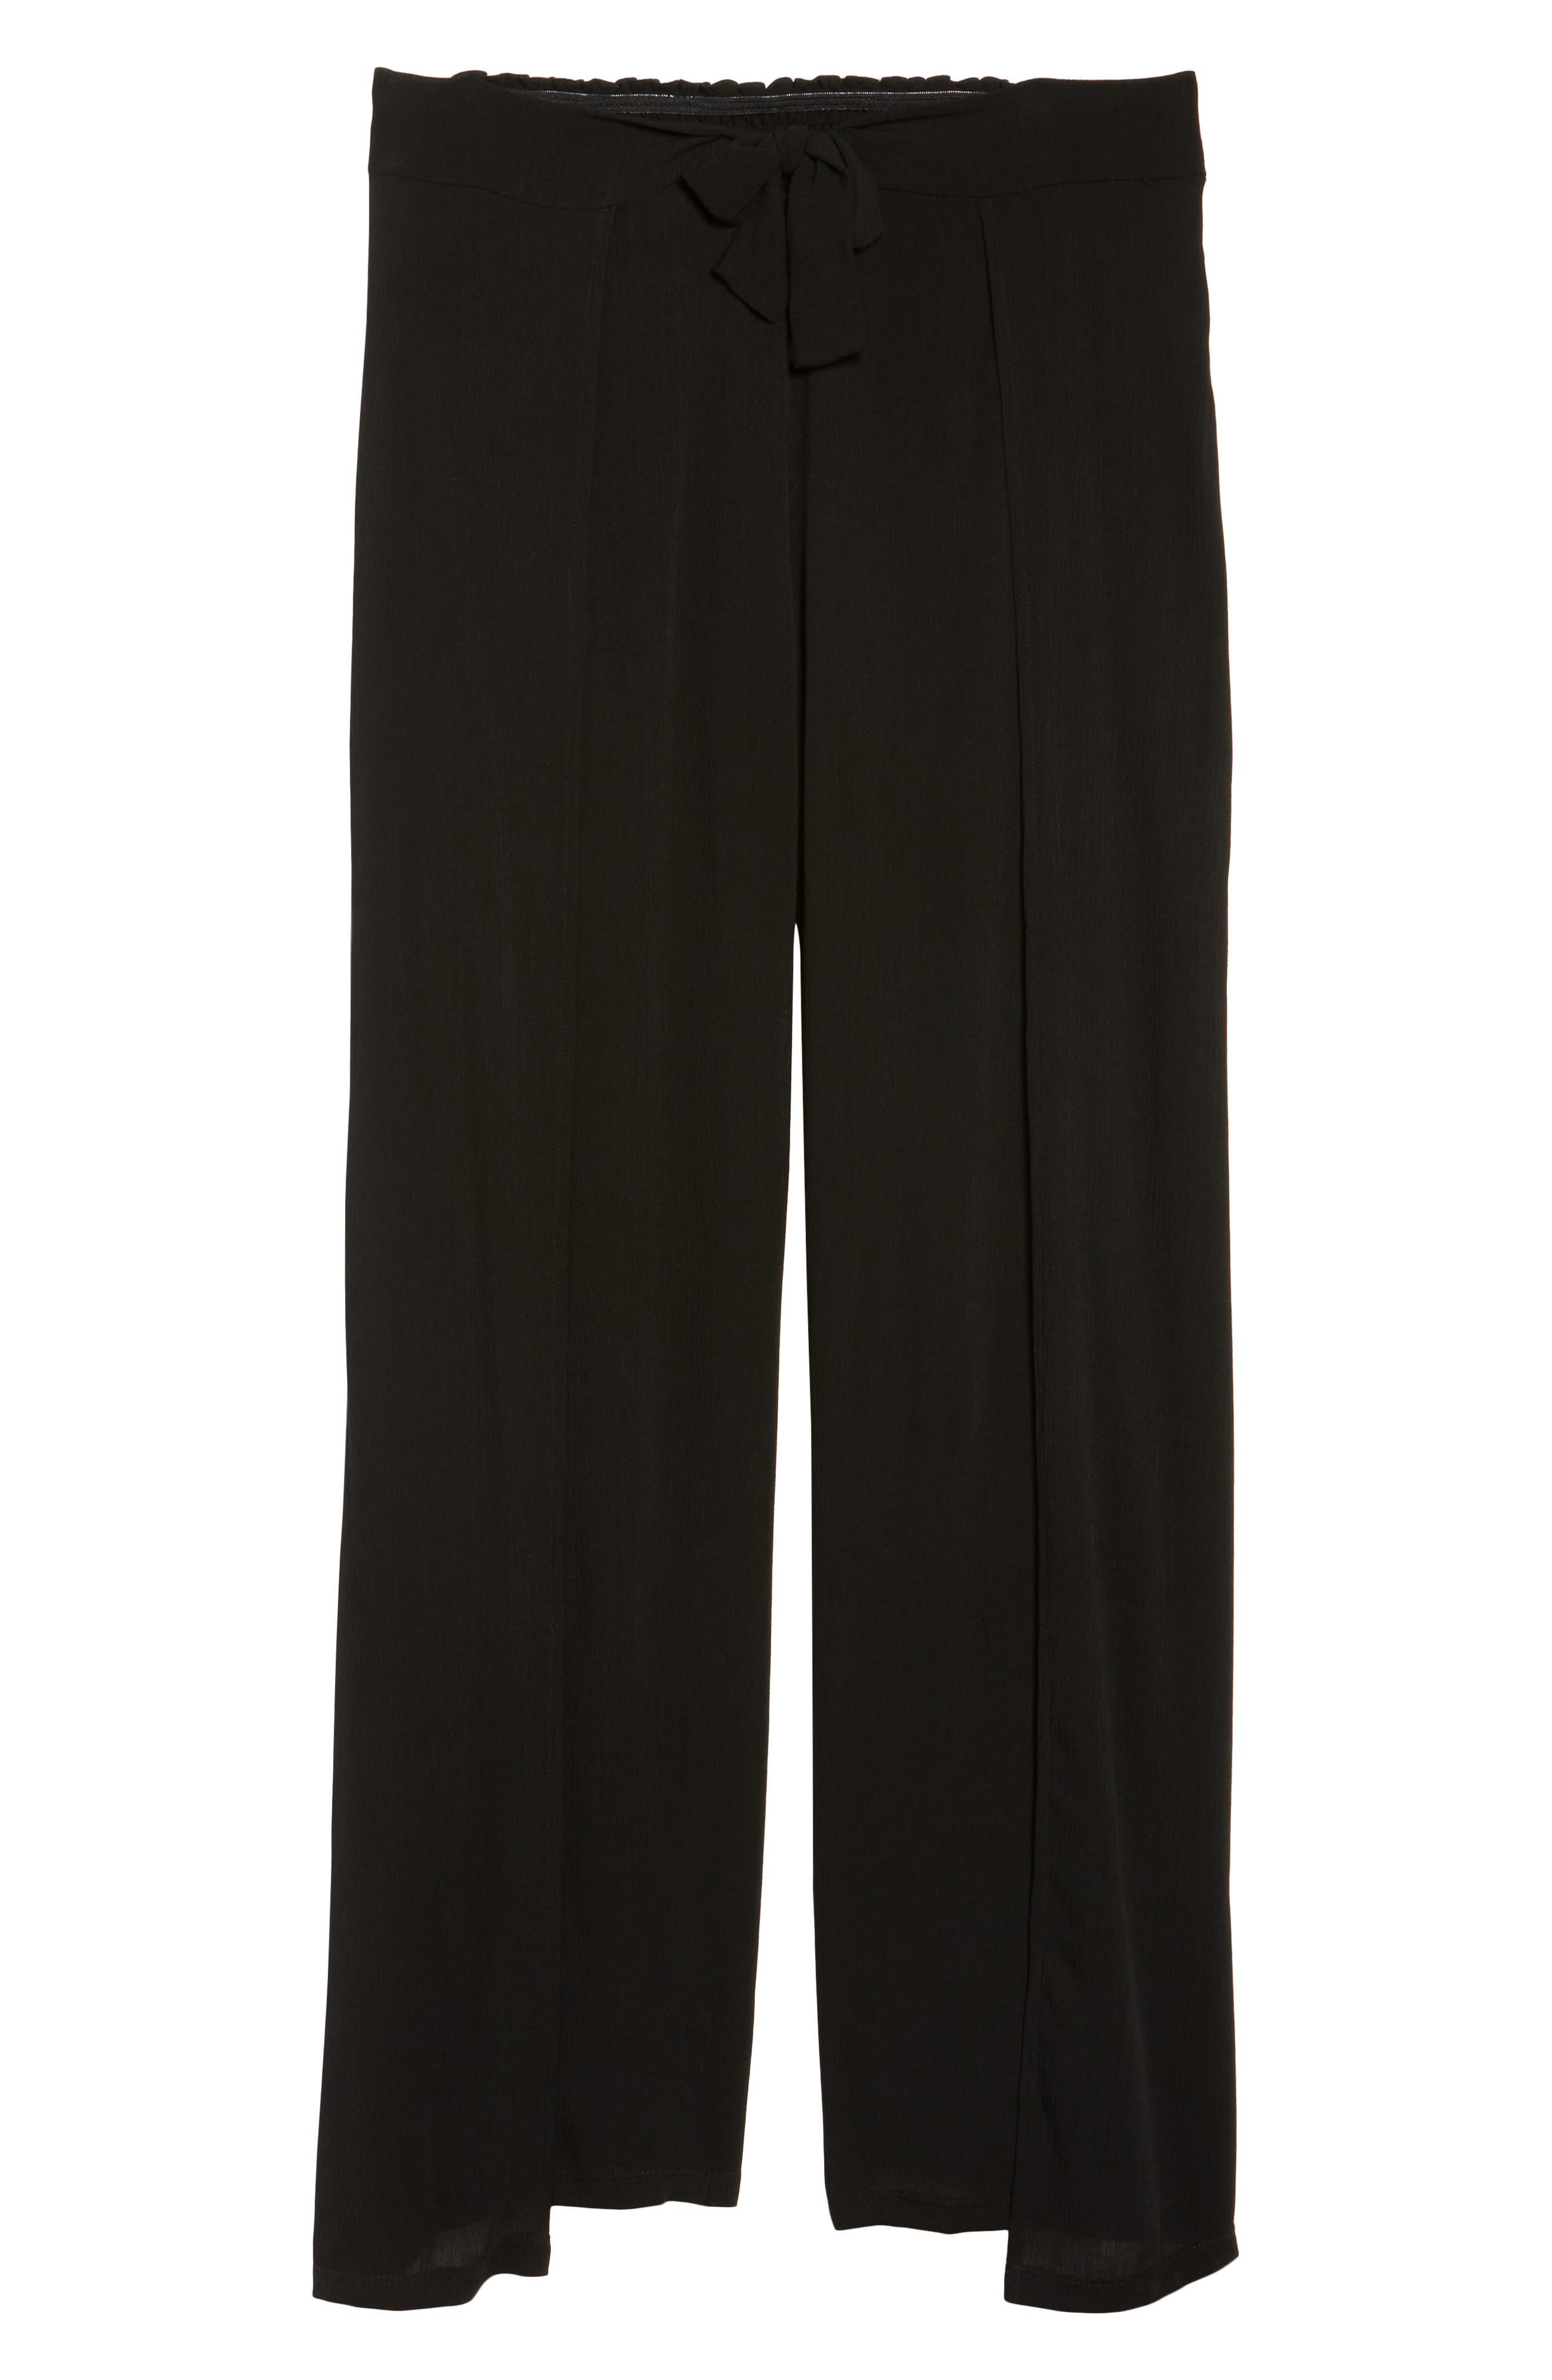 BECCA ETC., Modern Muse Cover-Up Pants, Alternate thumbnail 7, color, BLACK